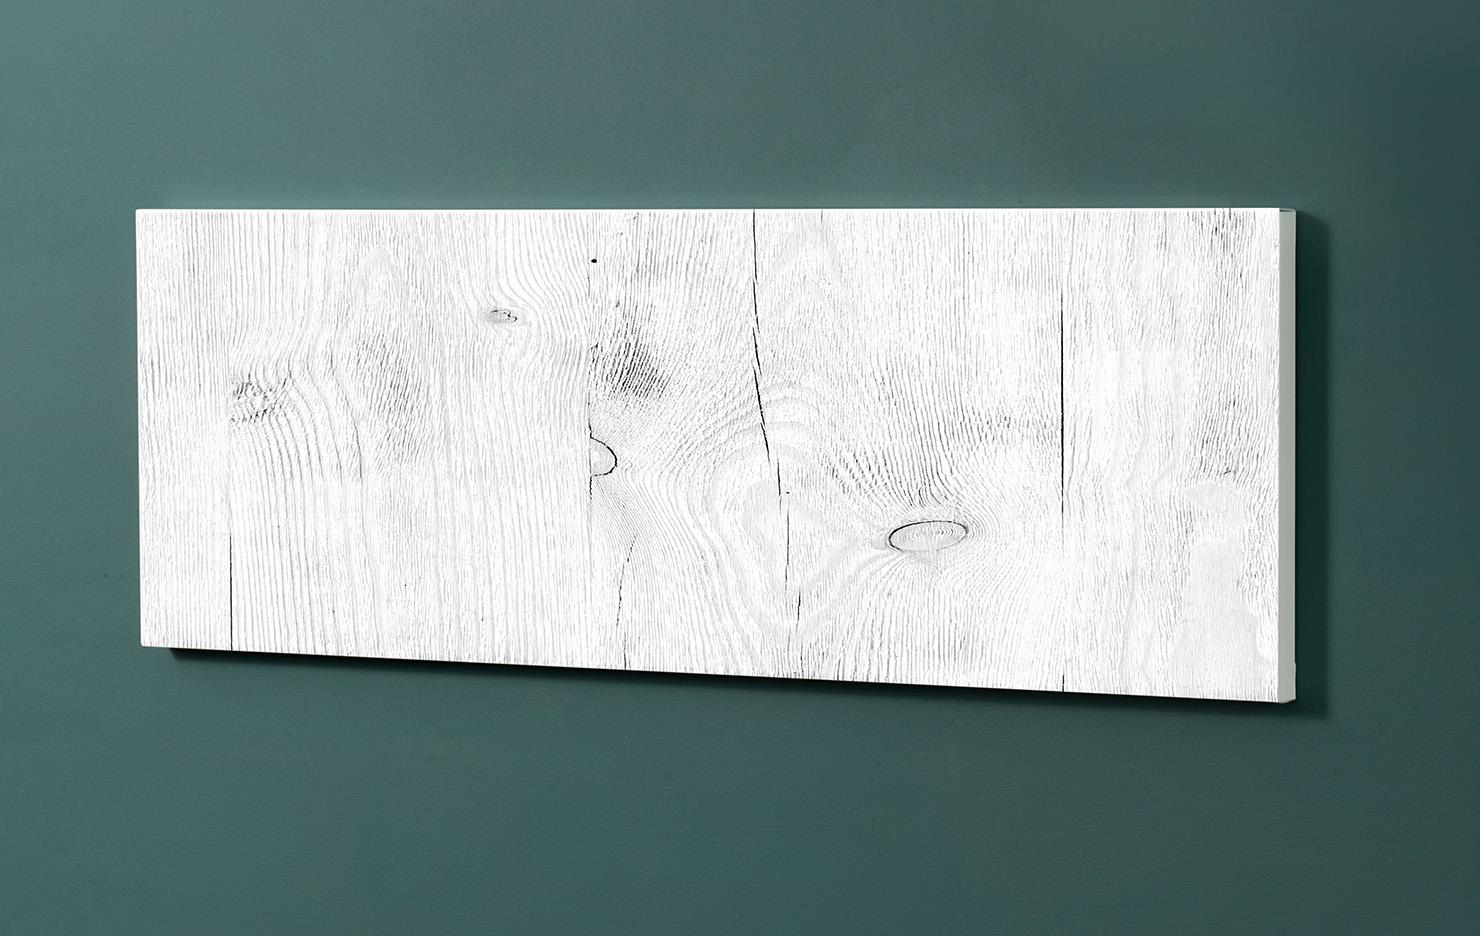 Magnettafel NOTIZ 90x30cm Motiv-Pinnwand M126 Holzbretter Vintage